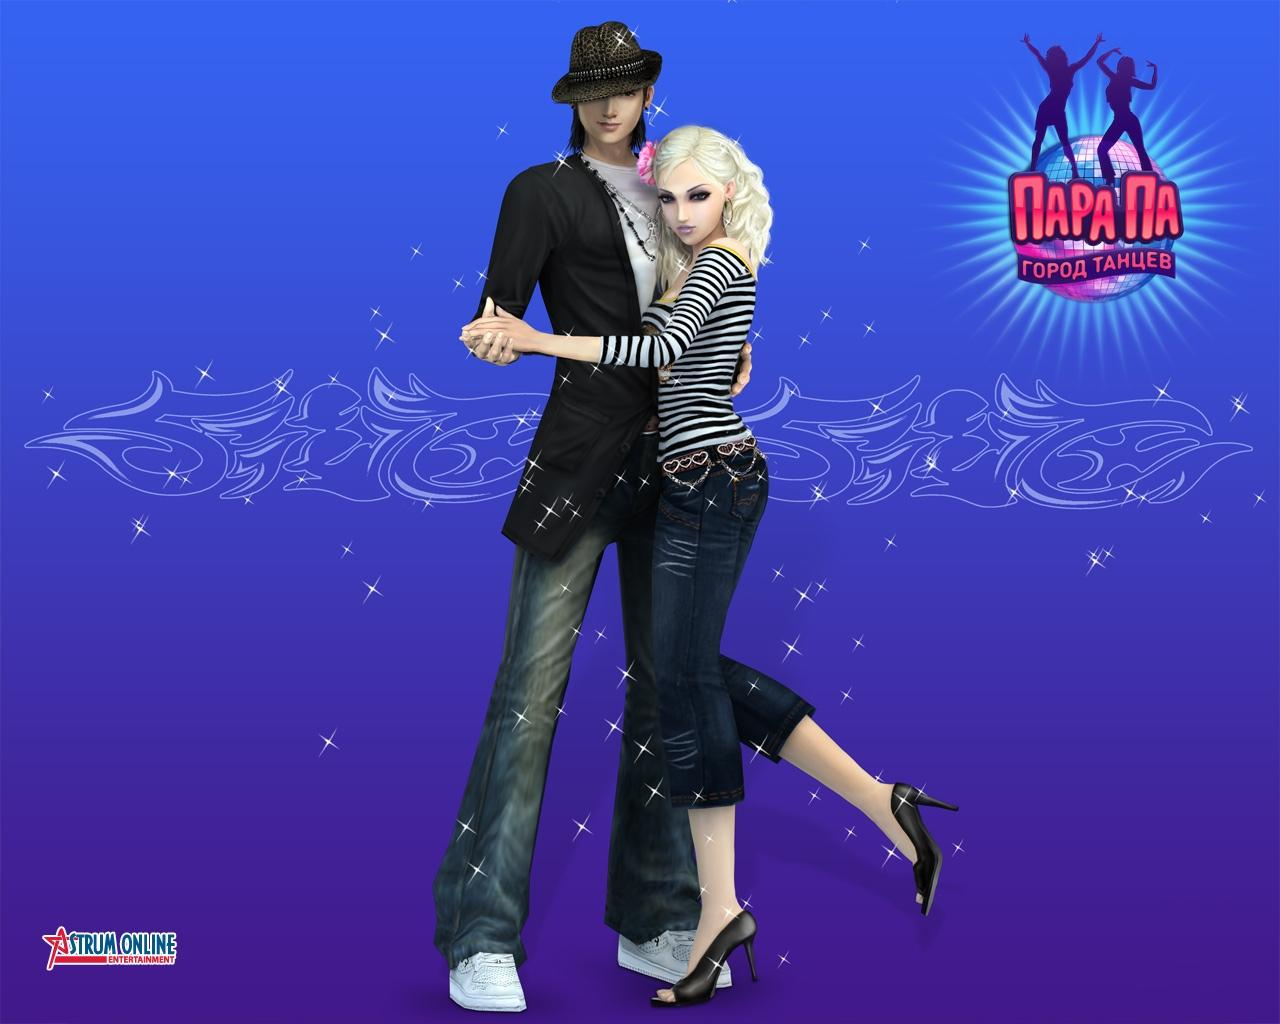 Beautiful dream пара па город танцев из игры my lady winter.